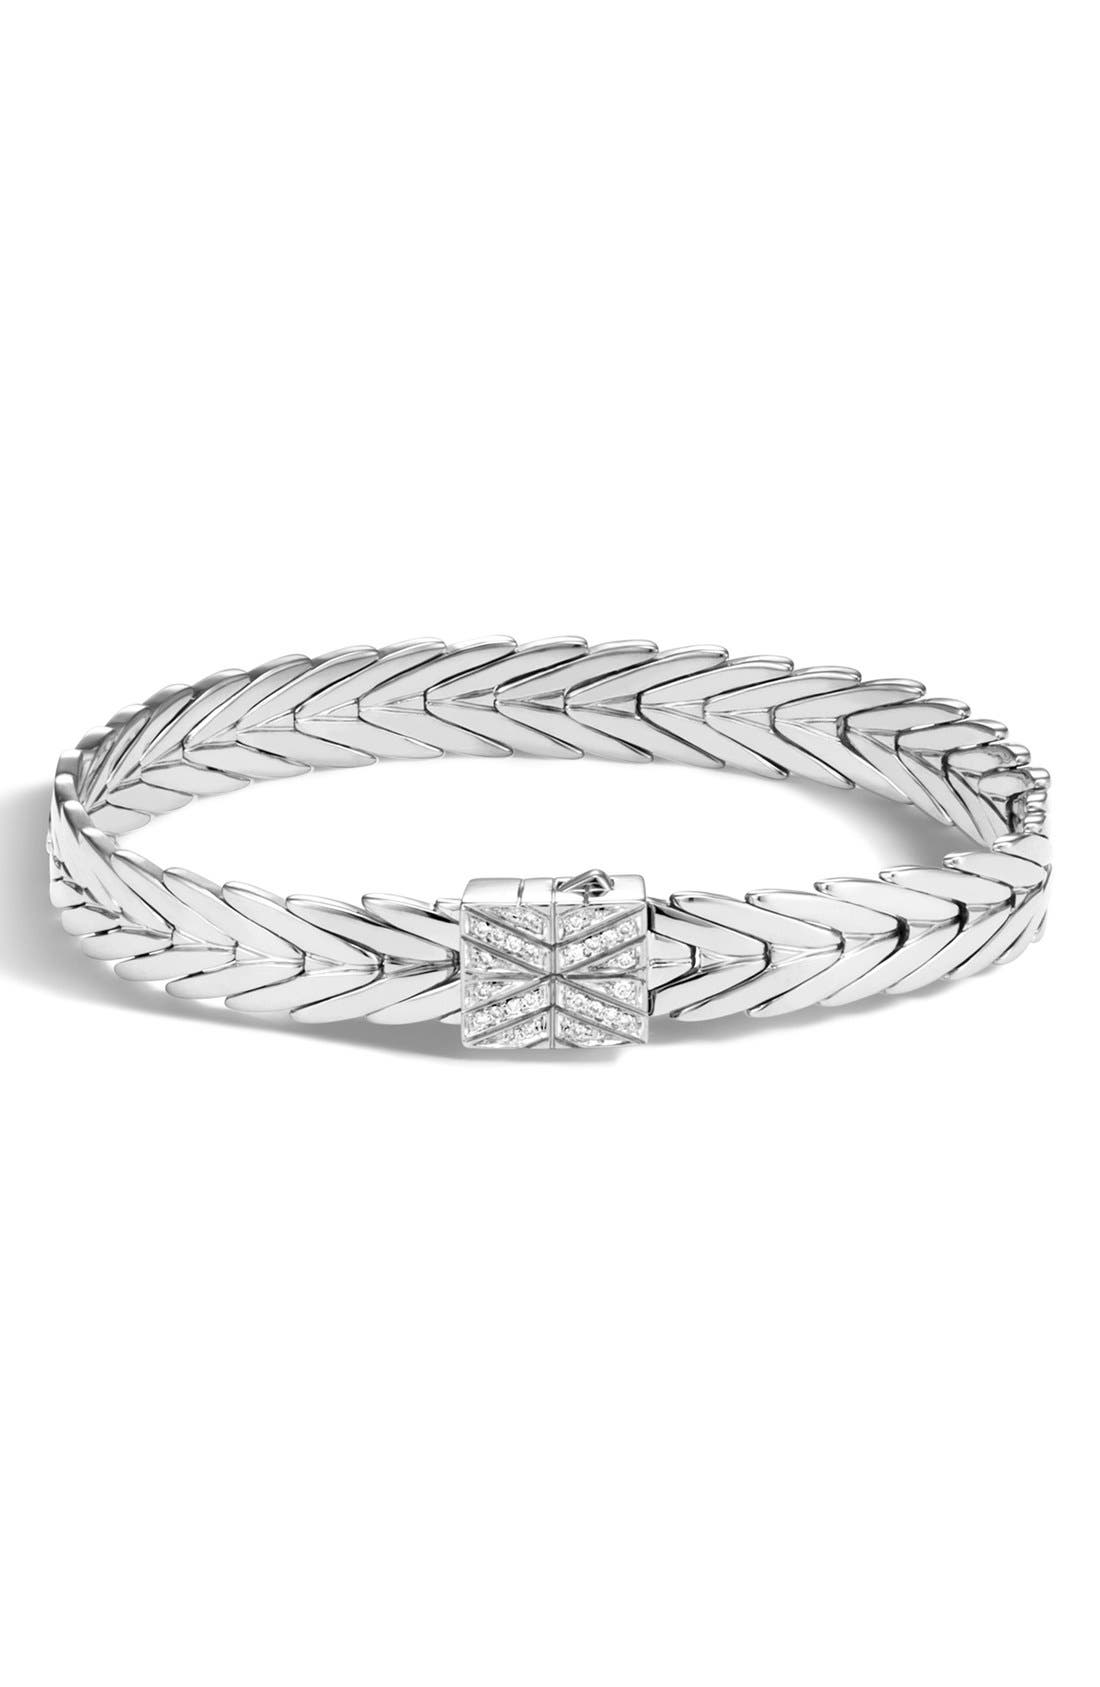 Modern Chain 8mm Bracelet,                             Main thumbnail 1, color,                             Silver/Diamond